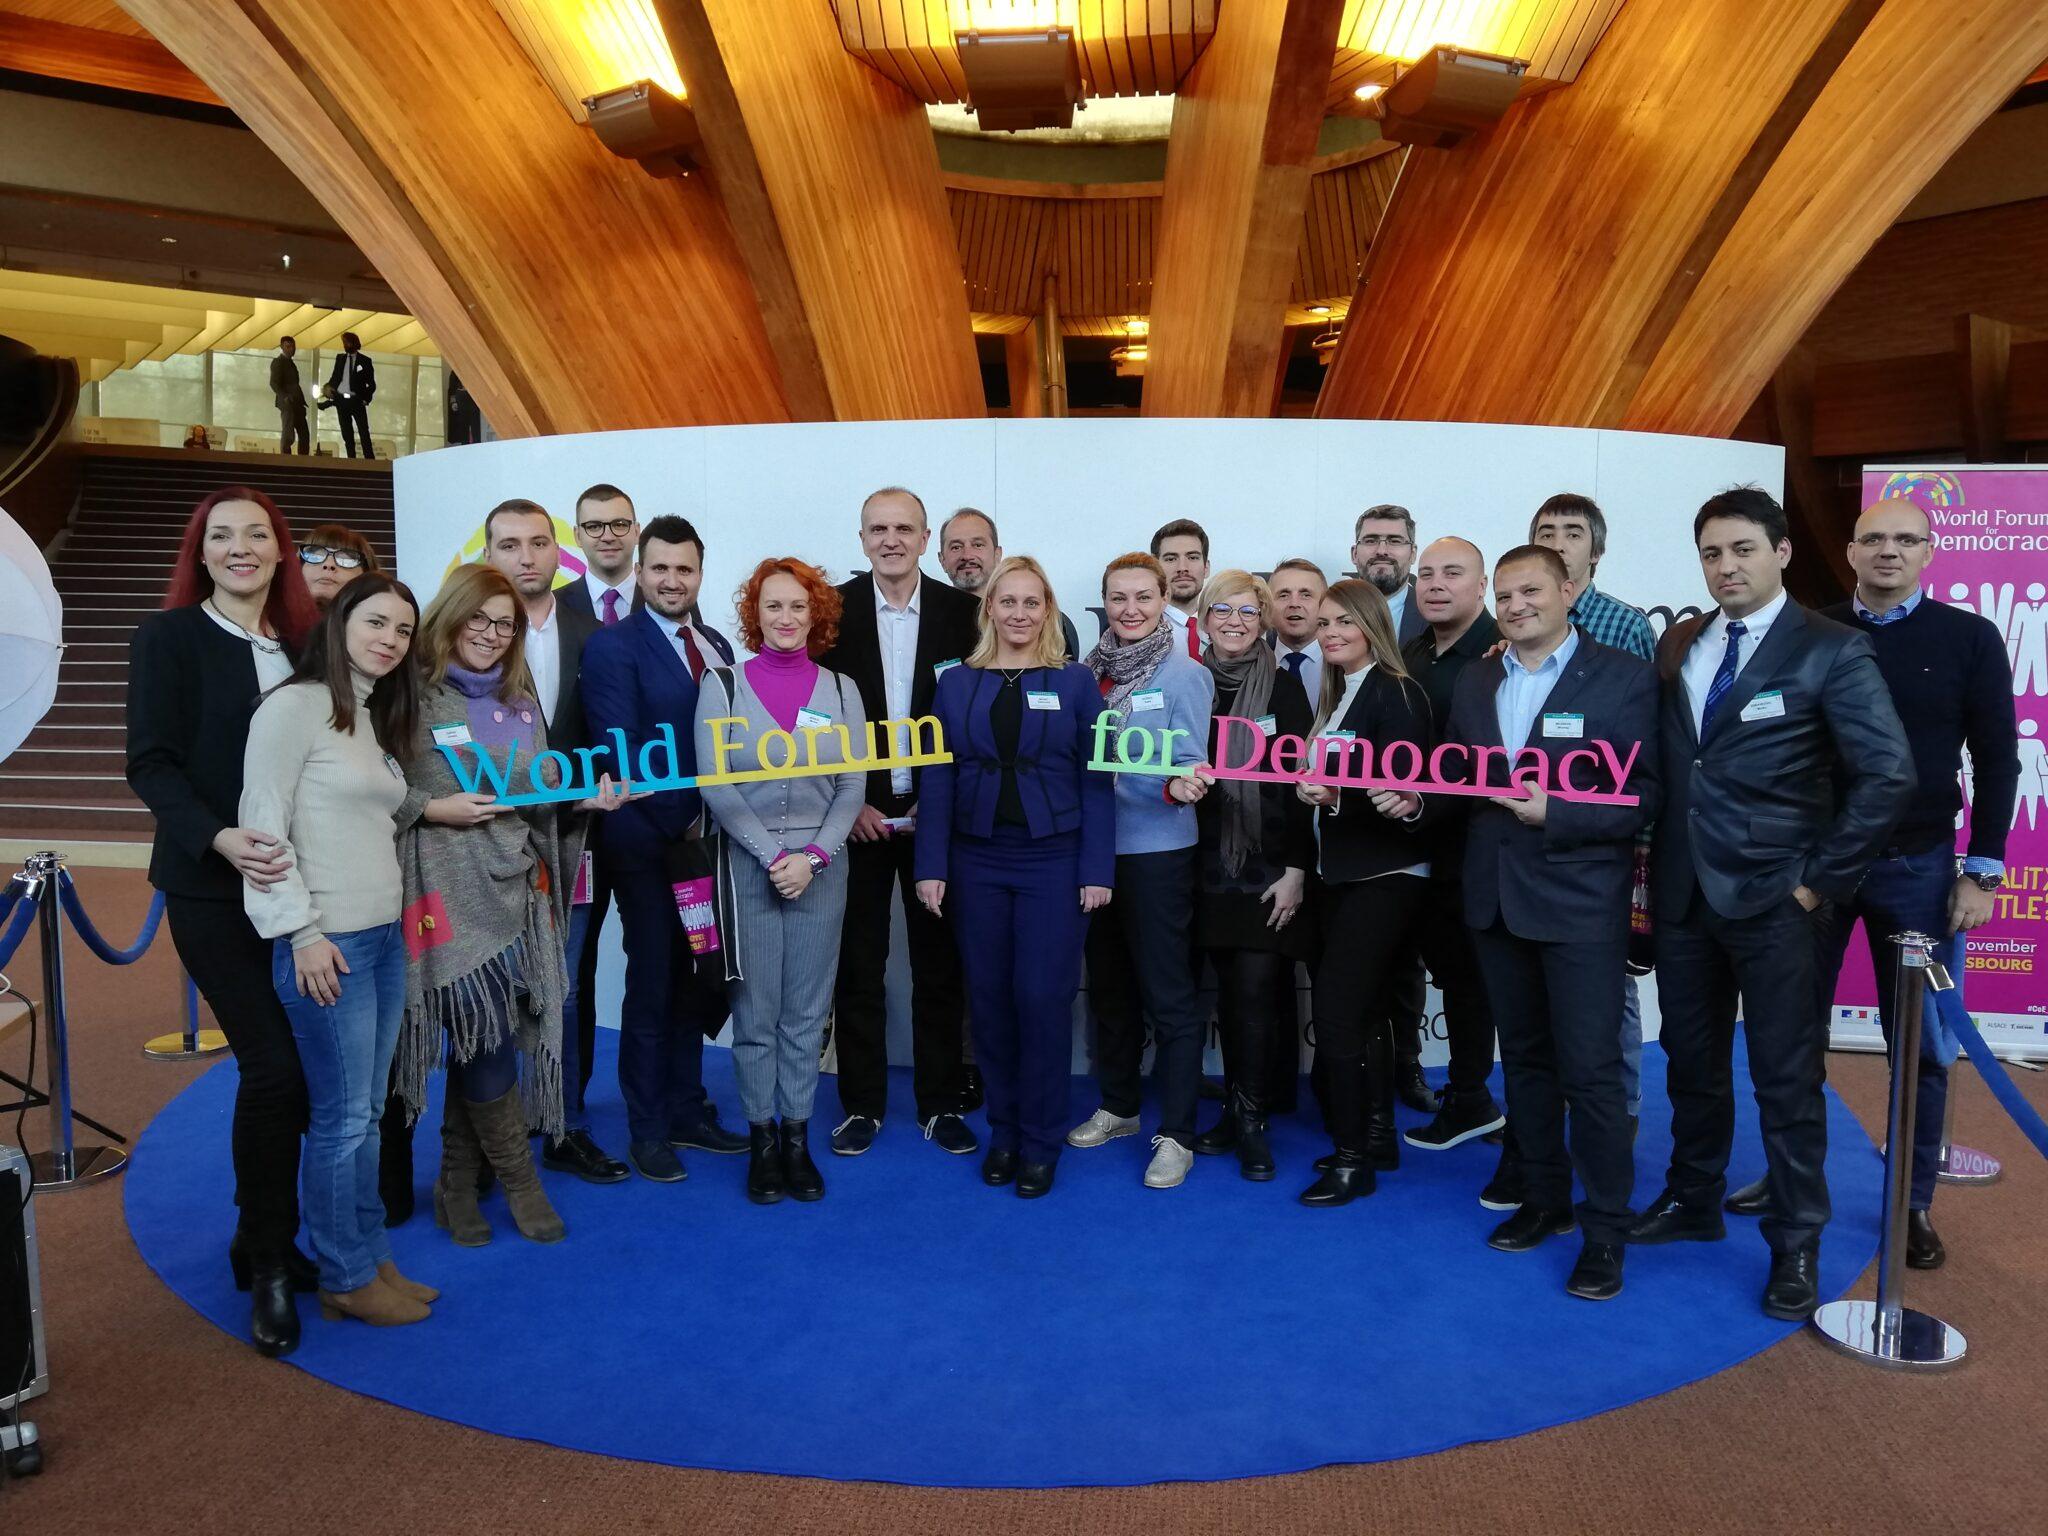 BFPE alumni @ World Forum for Democracy 2018